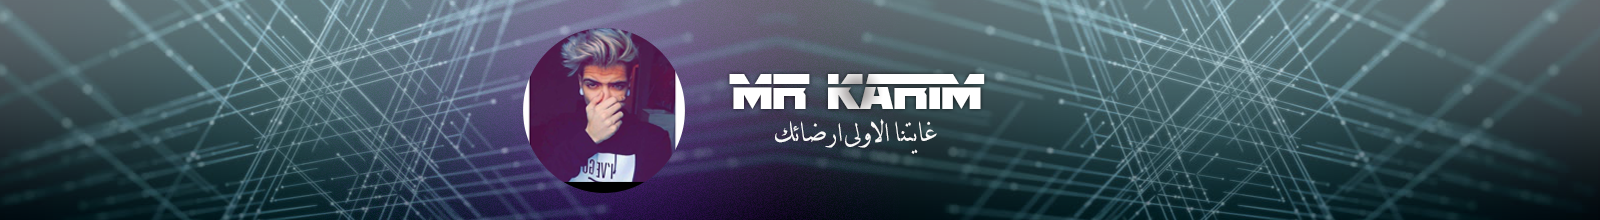 Mrkarim1